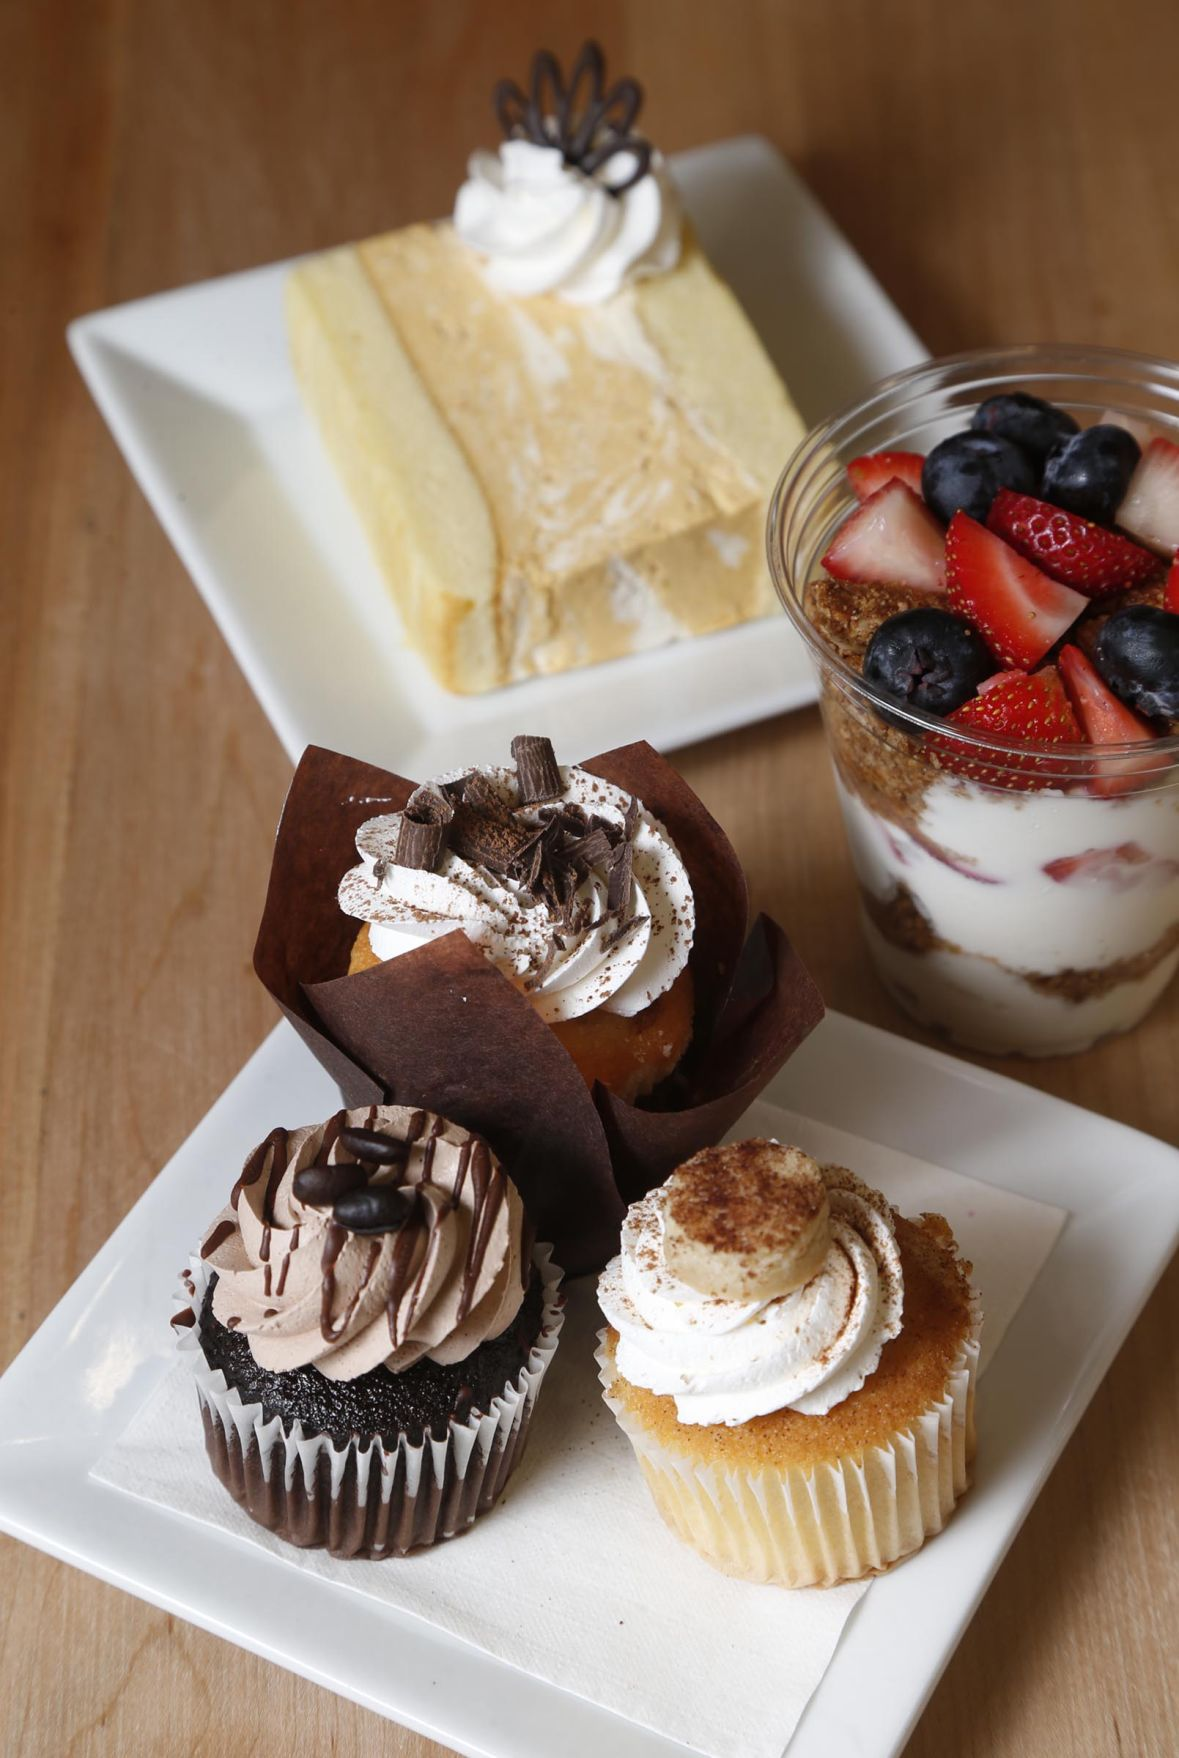 Ludger's desserts